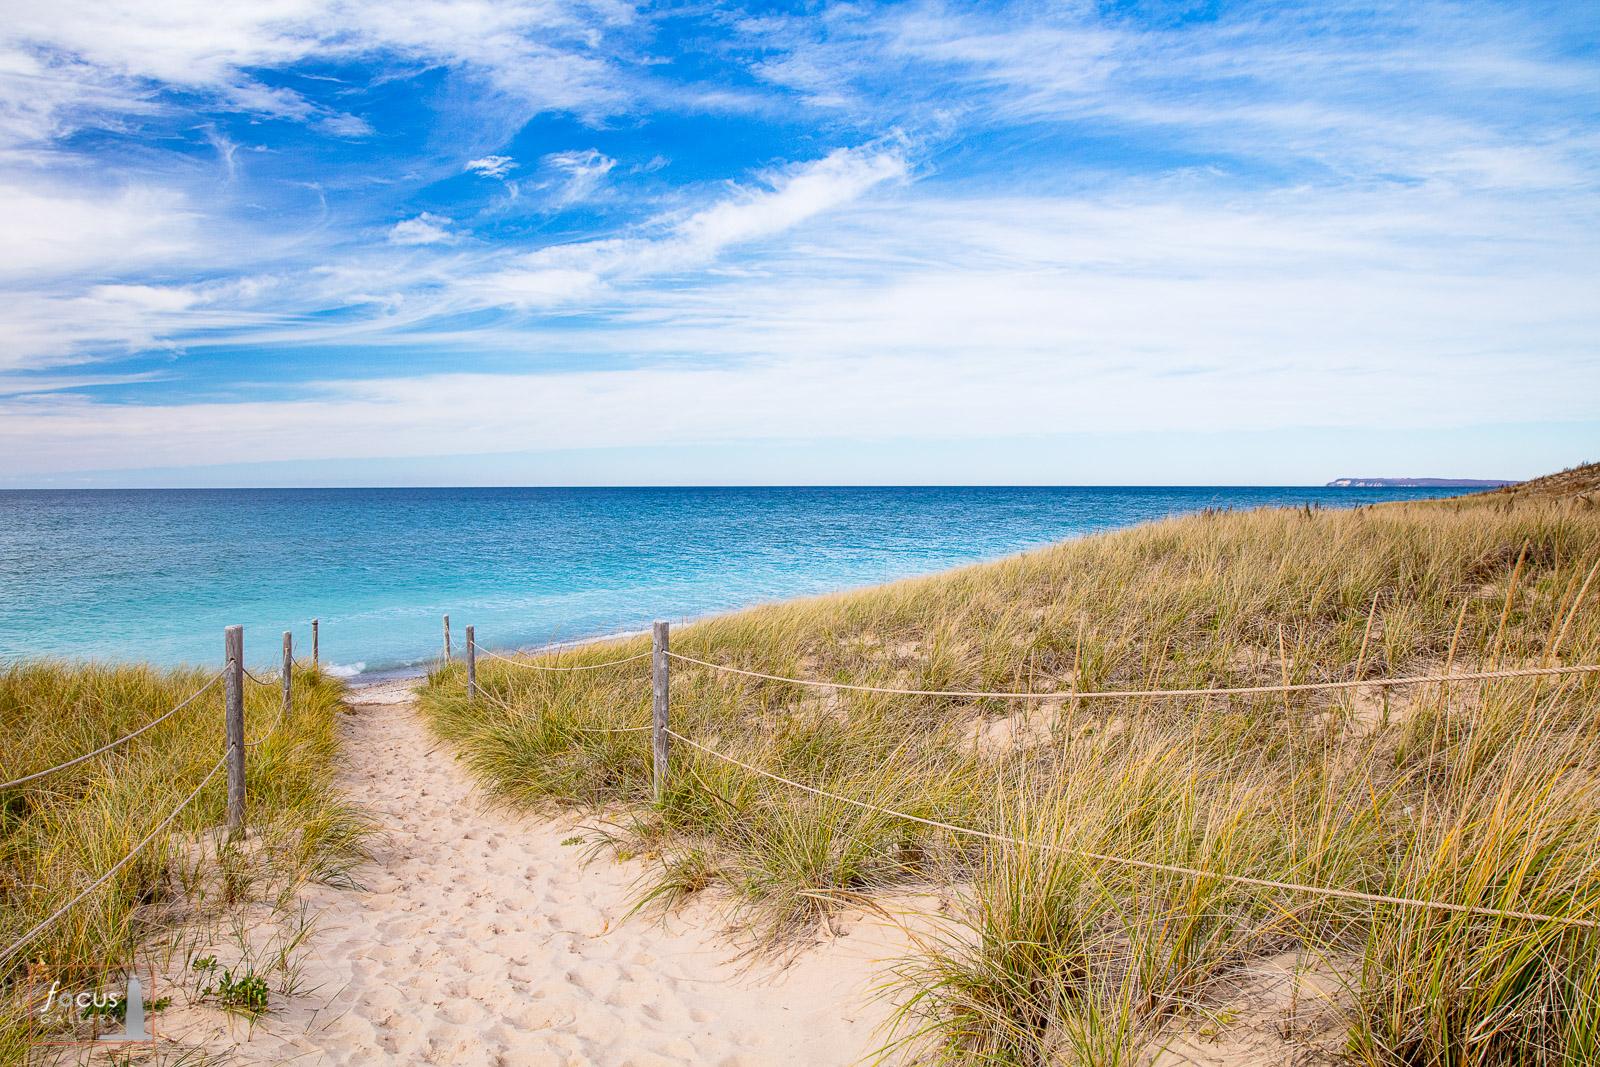 Photograph of the sandy trail to Lake Michigan near North Bar Lake, Sleeping Bear Dunes, Michigan